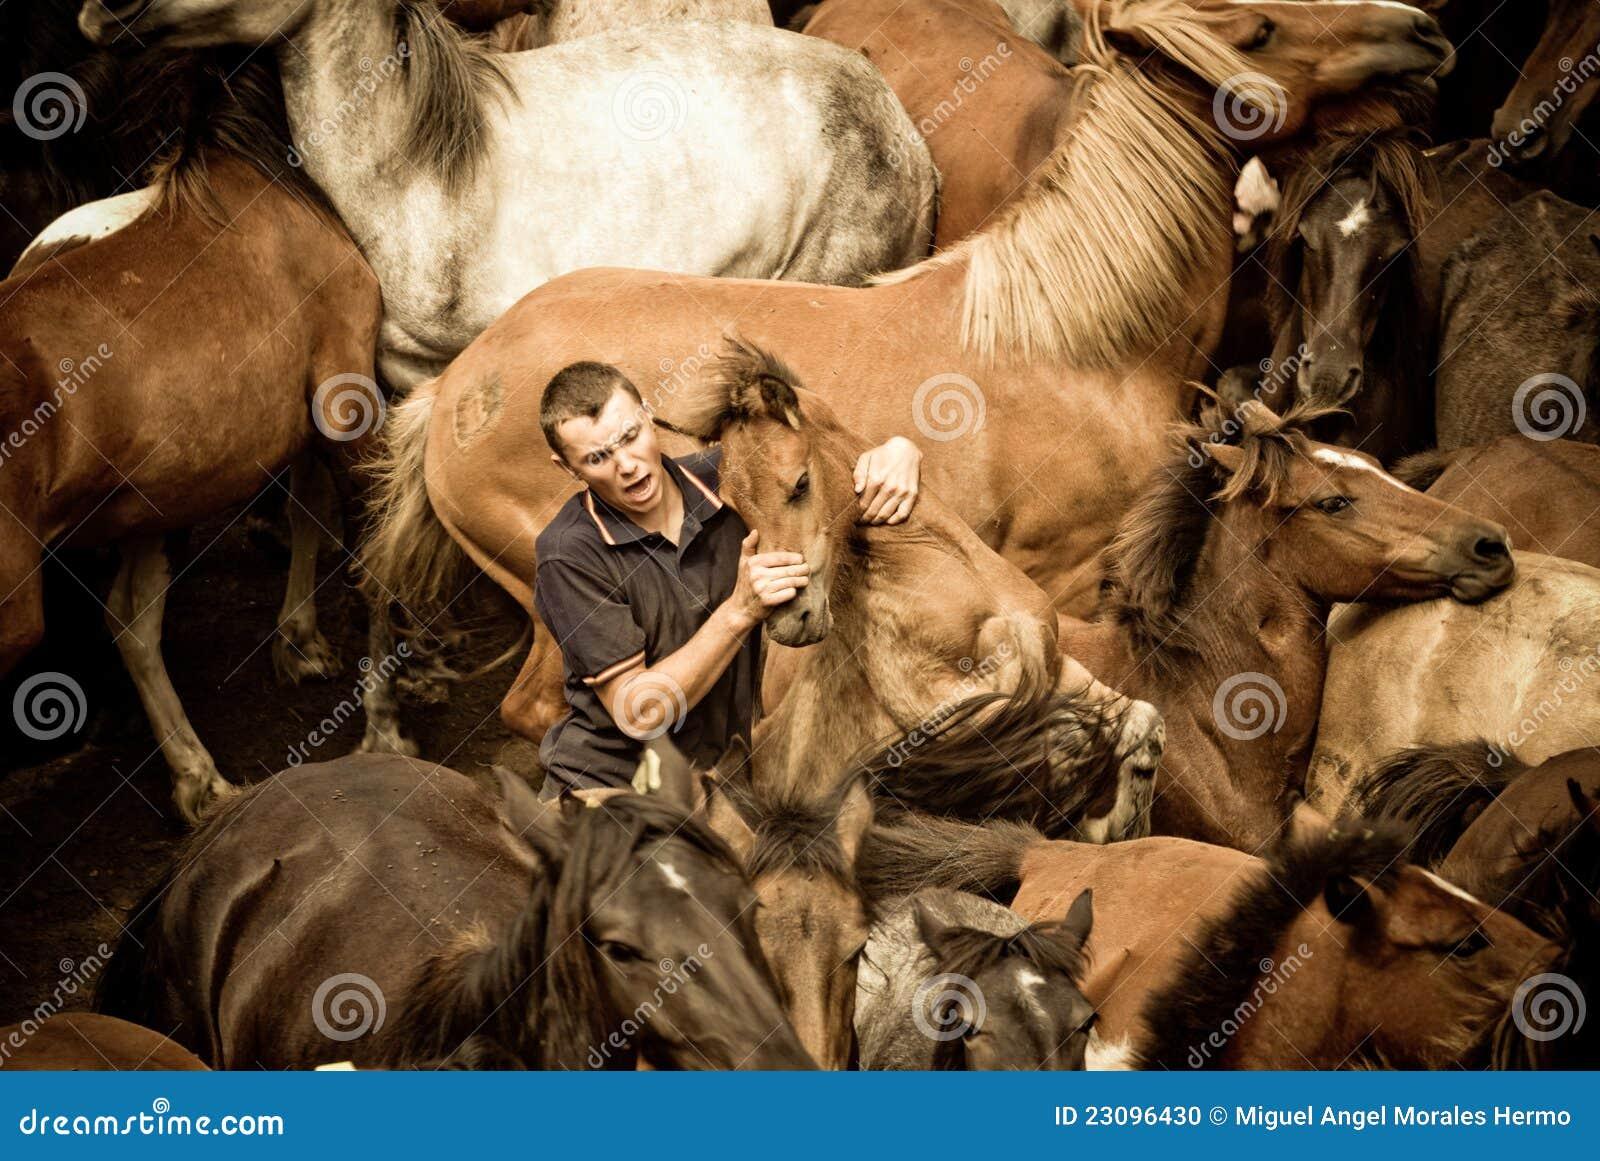 Breaking Horses Editorial Image Image 23096430